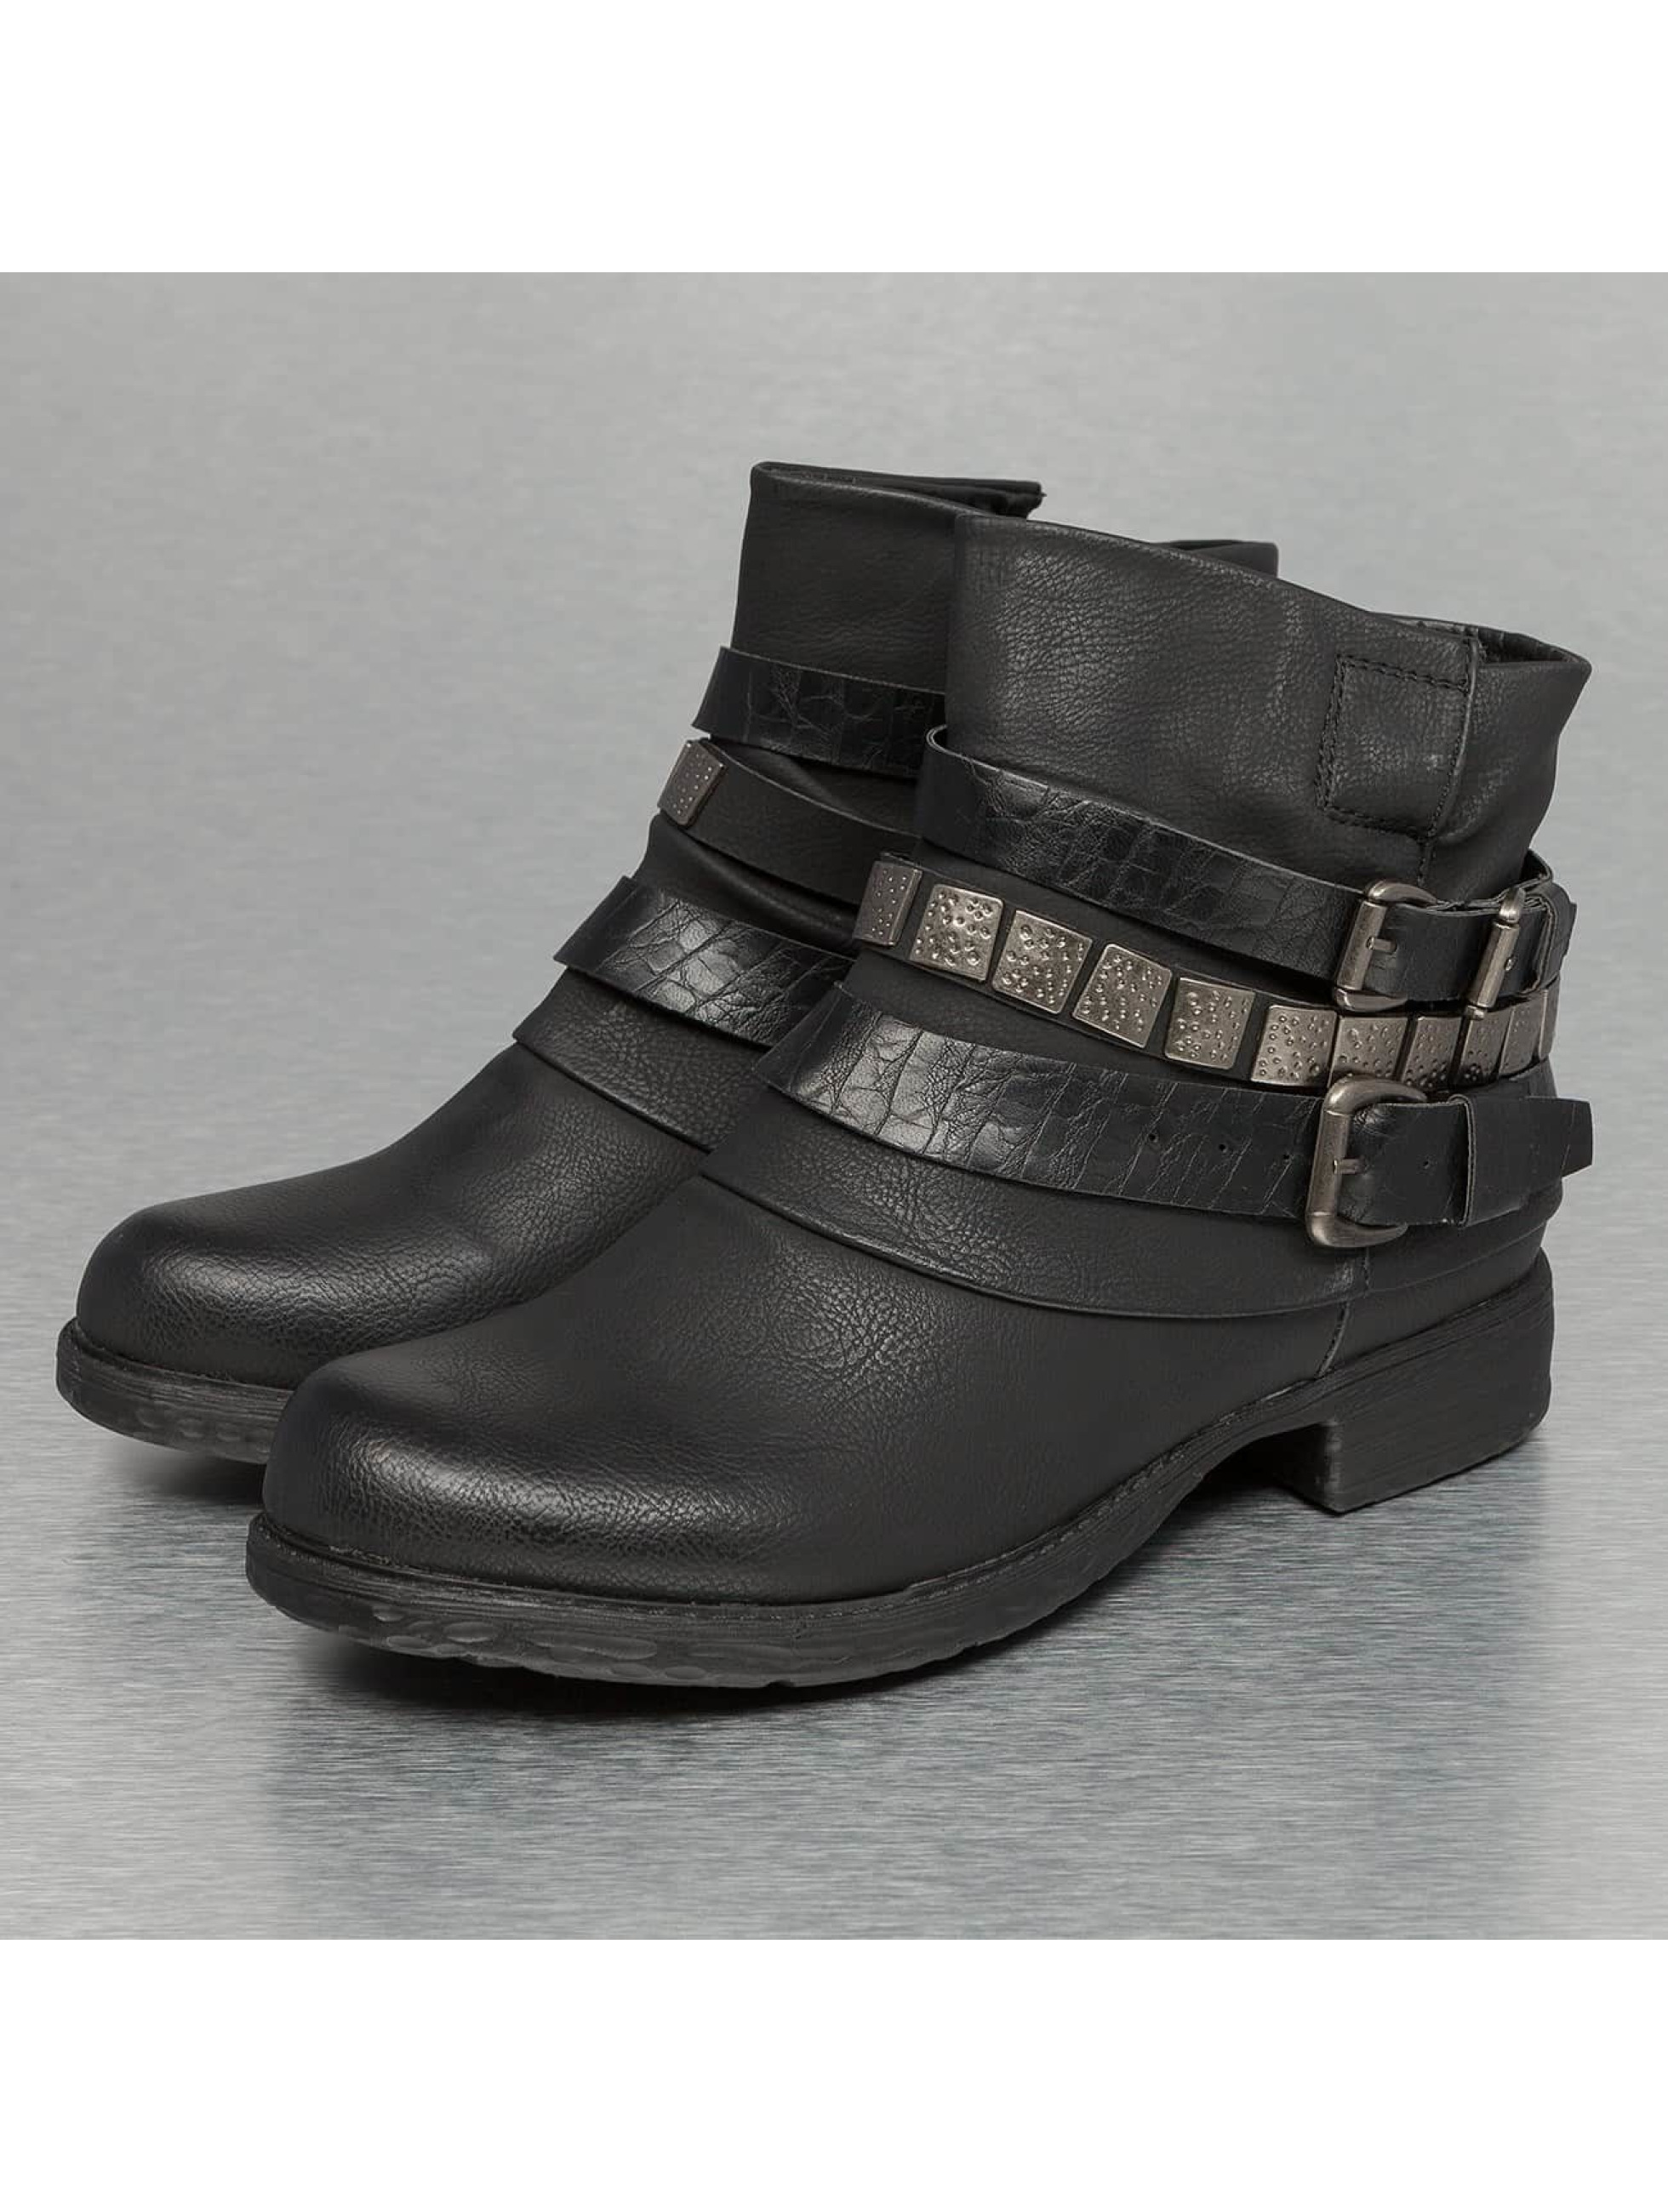 Jumex Chaussures / Botte/Bottine Chain Low en noir